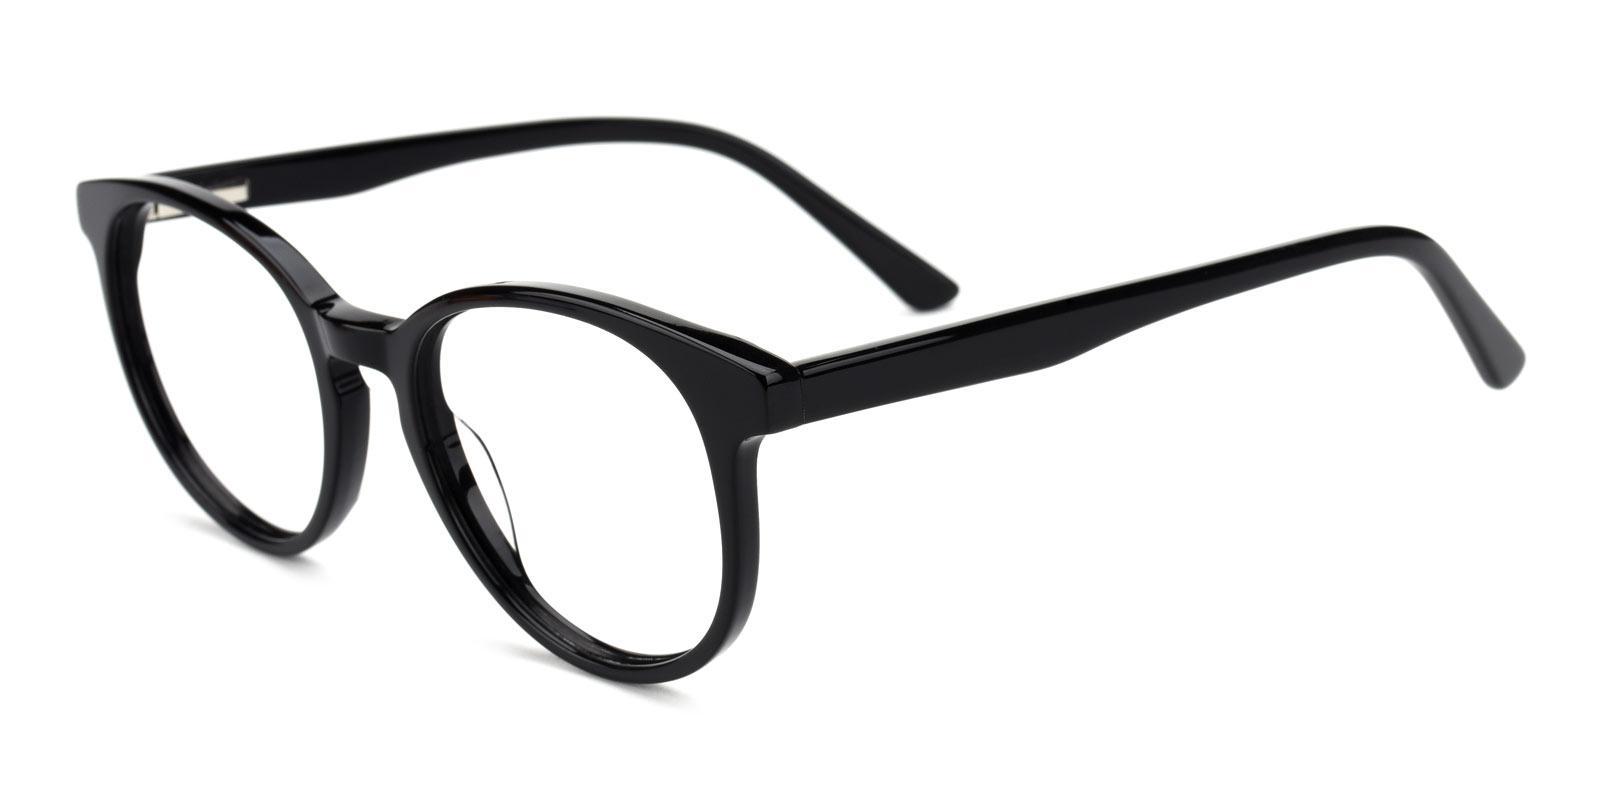 Patti-Black-Round-Acetate-Eyeglasses-detail